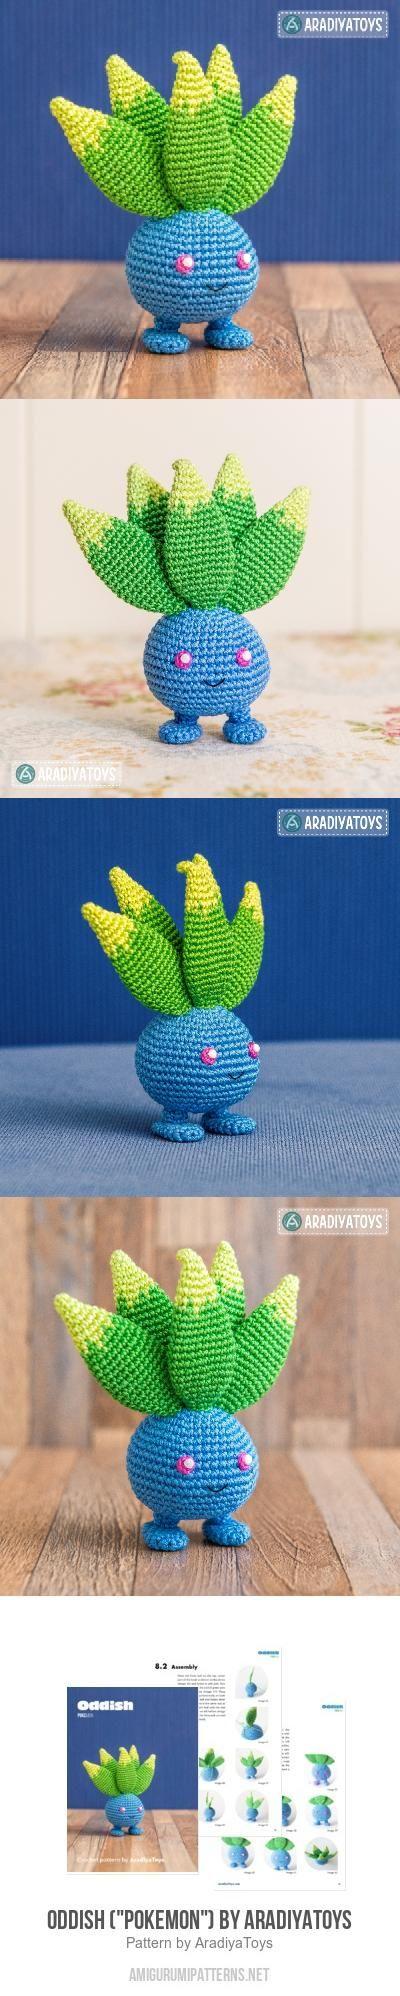 "Oddish (""Pokemon"") Amigurumi Pattern"